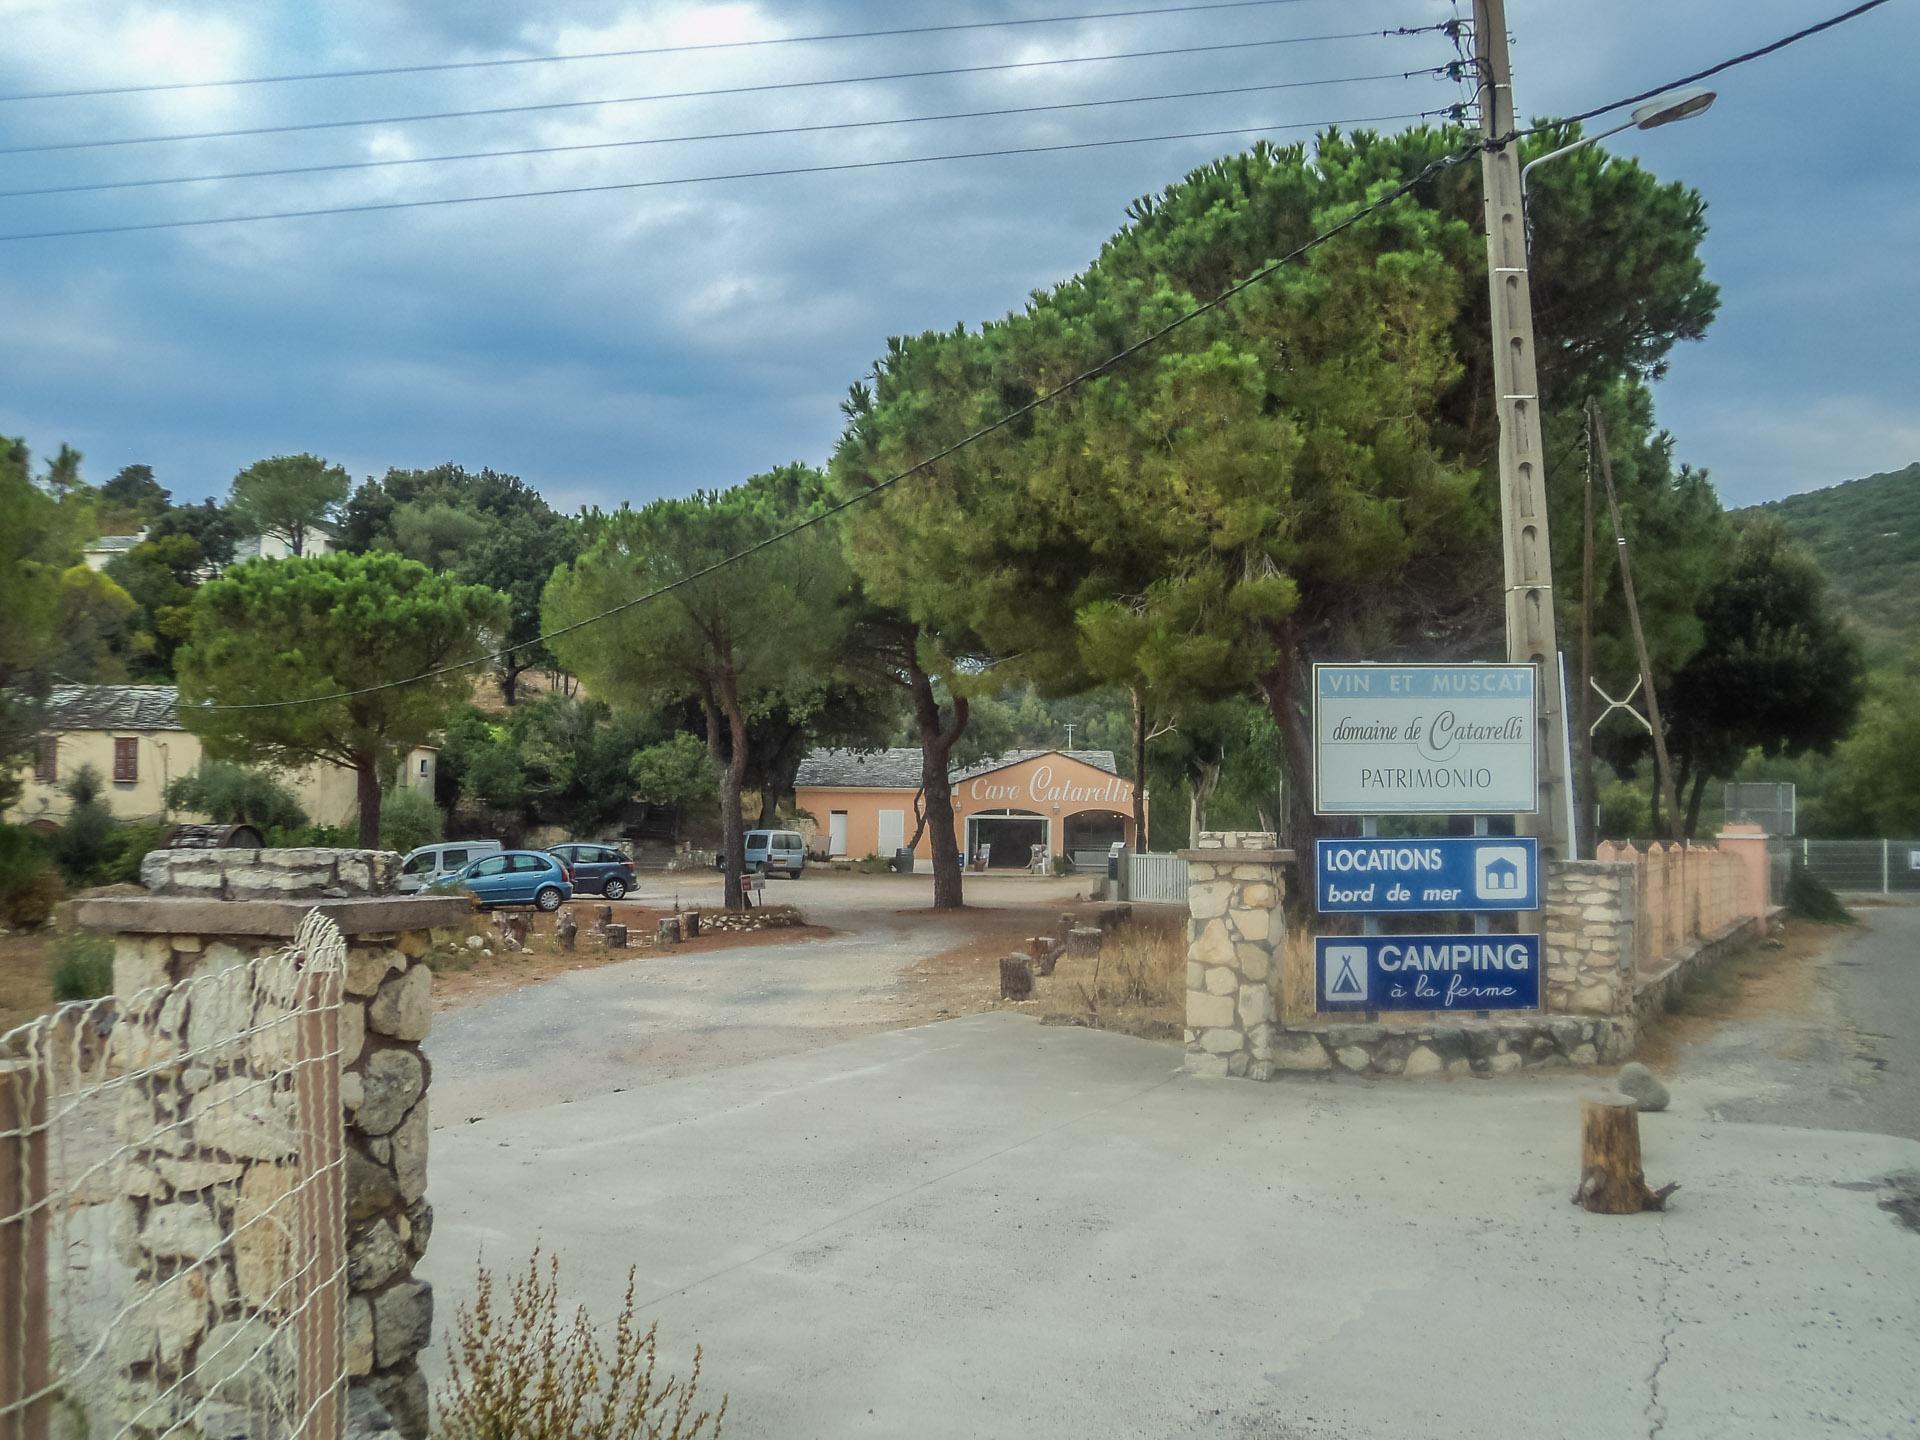 Camping Domaine de Catarelli